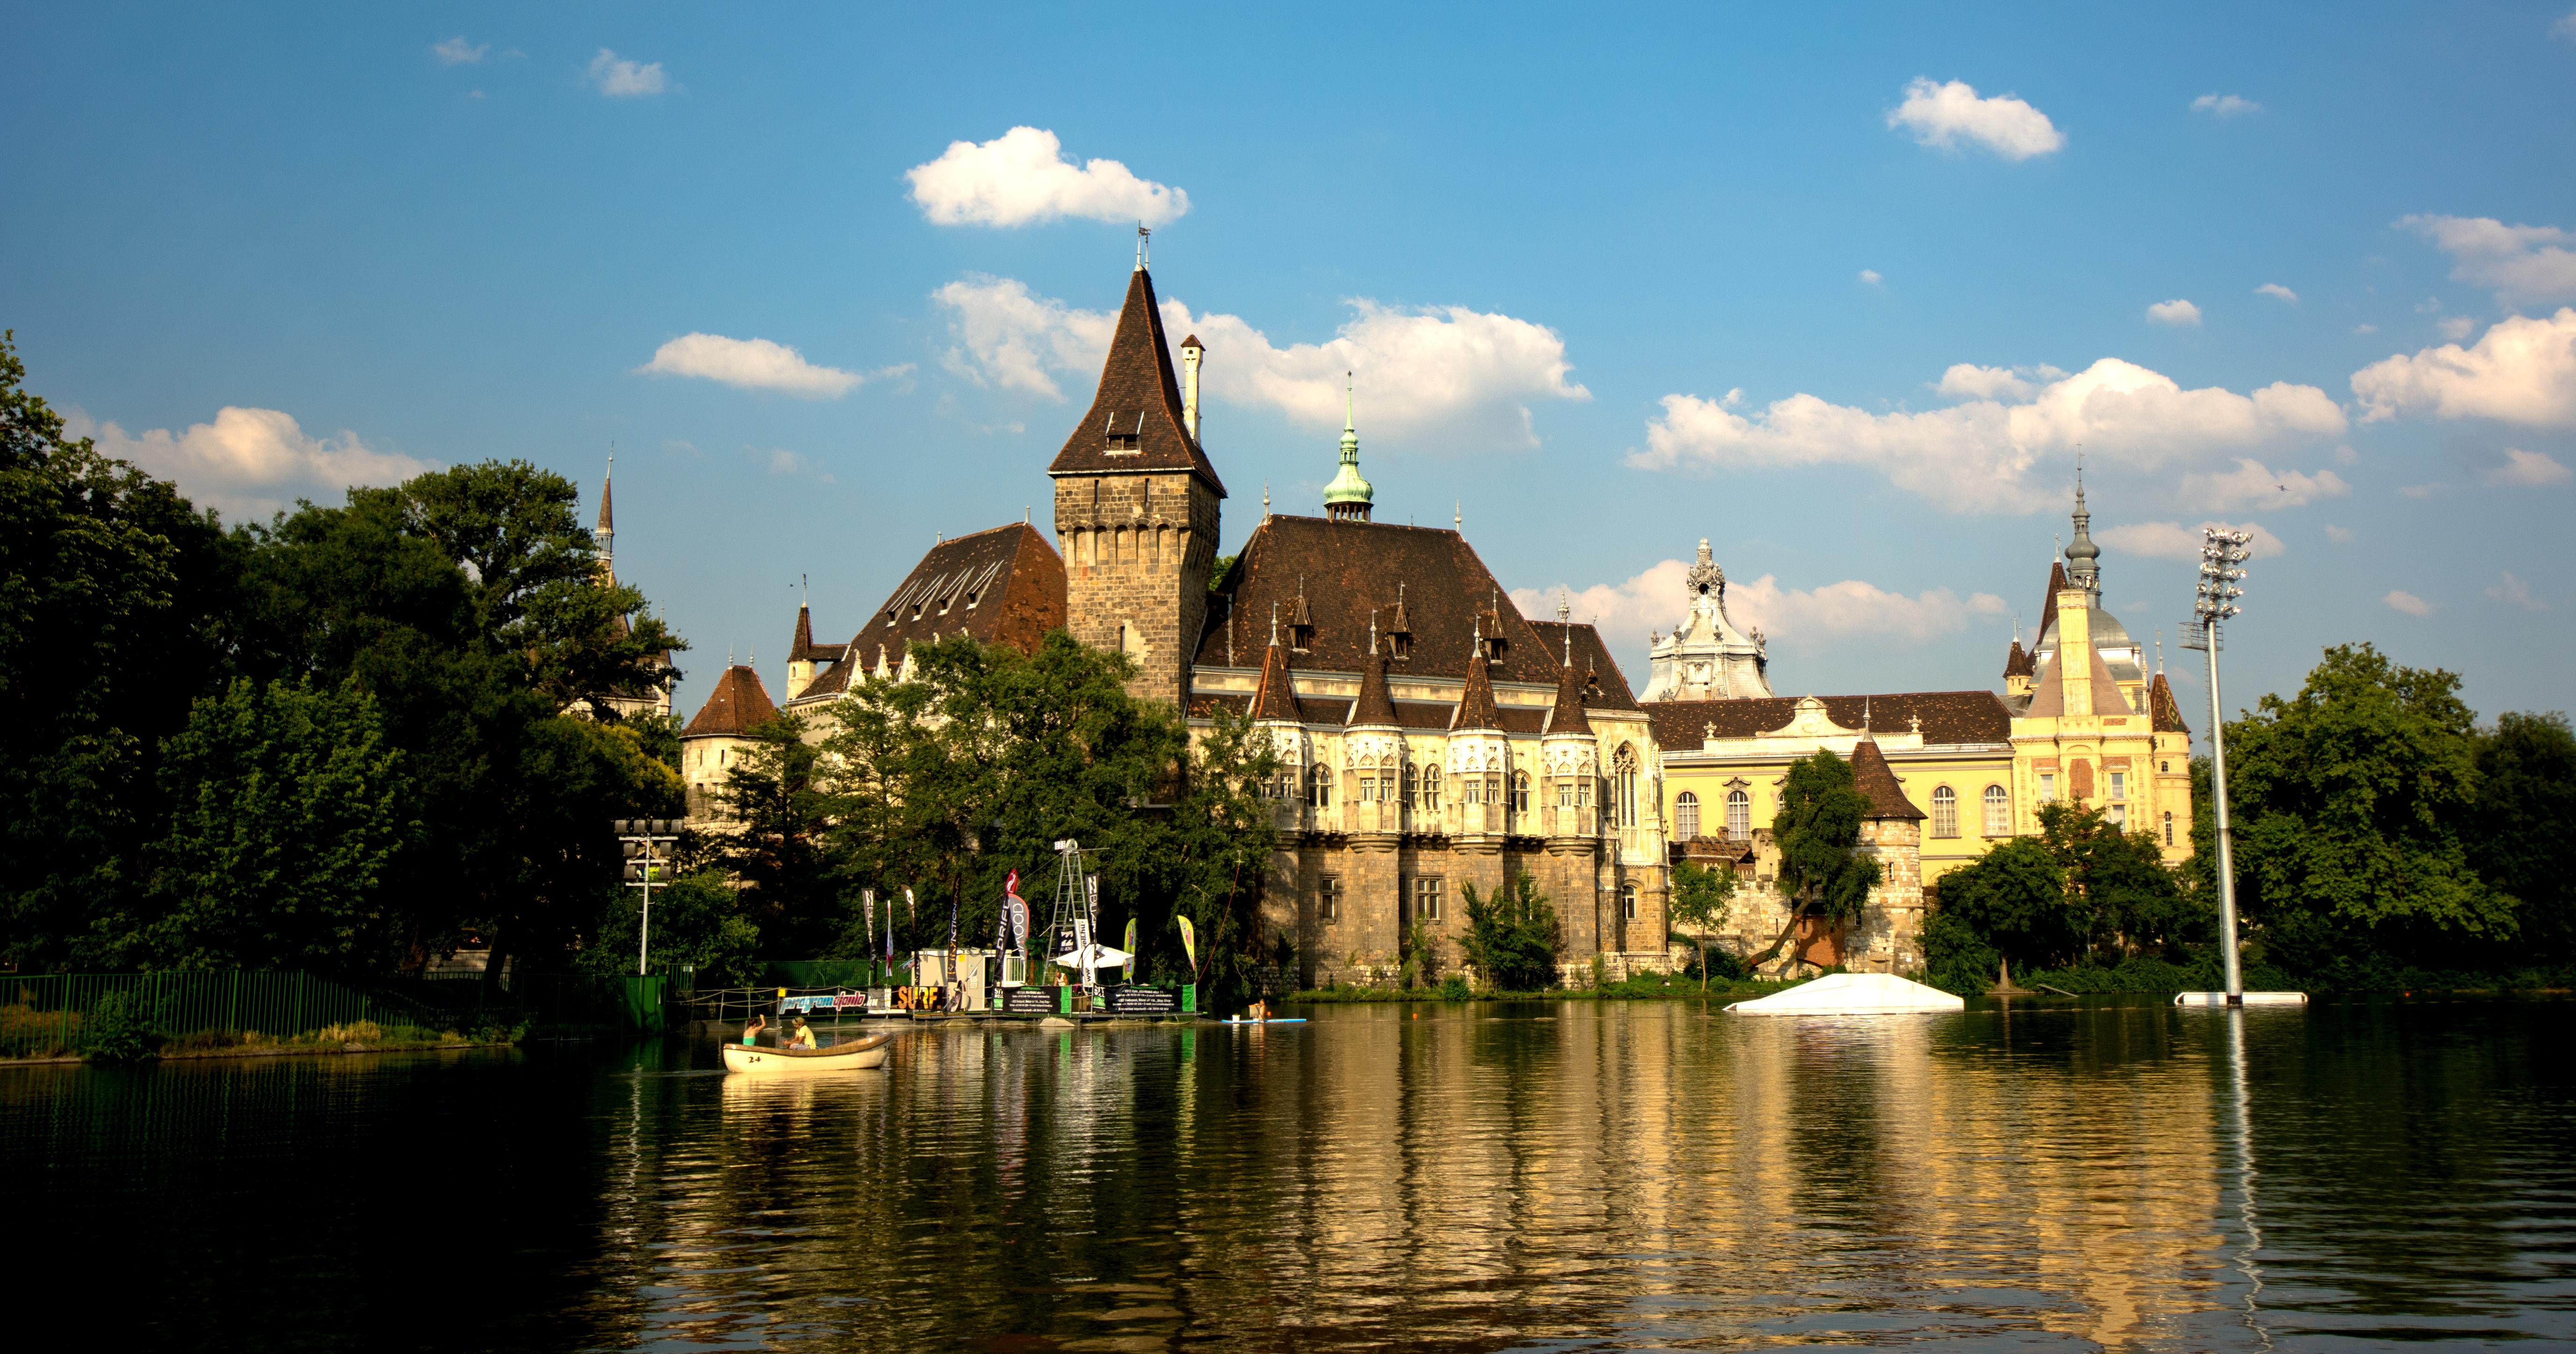 vajdahunyad castle - wikipedia